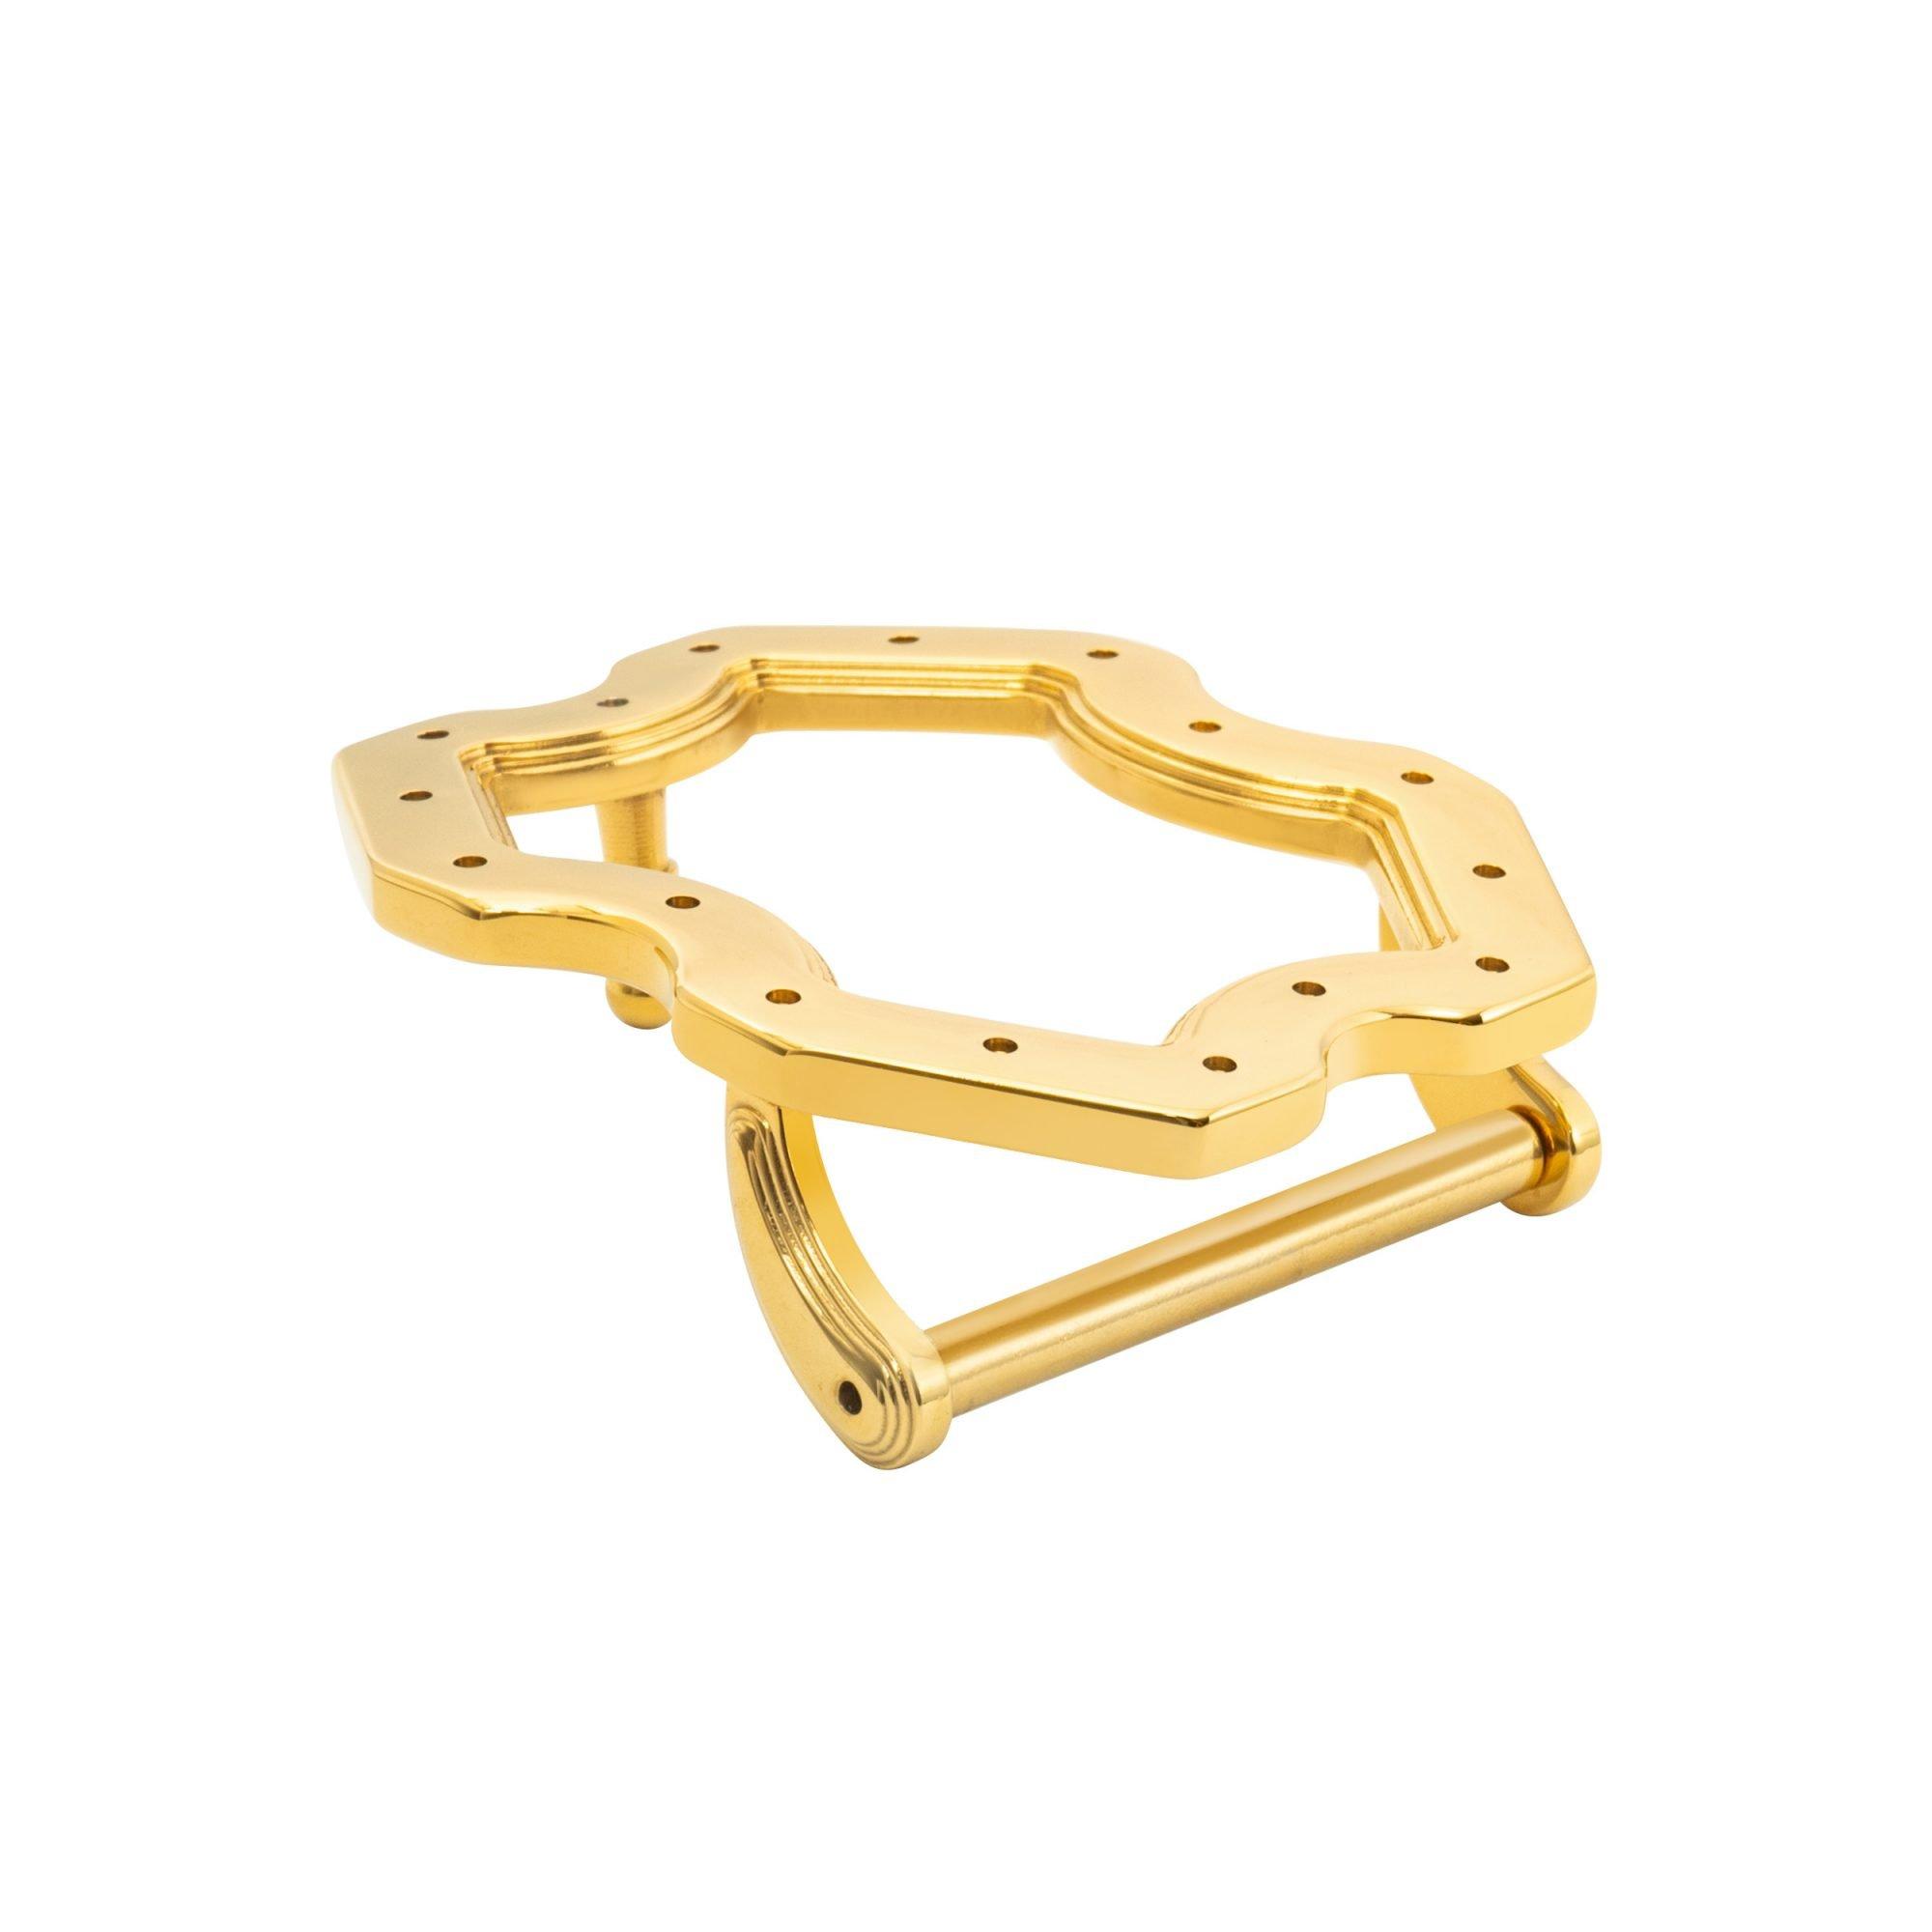 VIKTOR ALEXANDER 38MM STAINLESS STEEL BELT BUCKLE X FRAME INDENTED YELLOW GOLD SIDE PROFILE